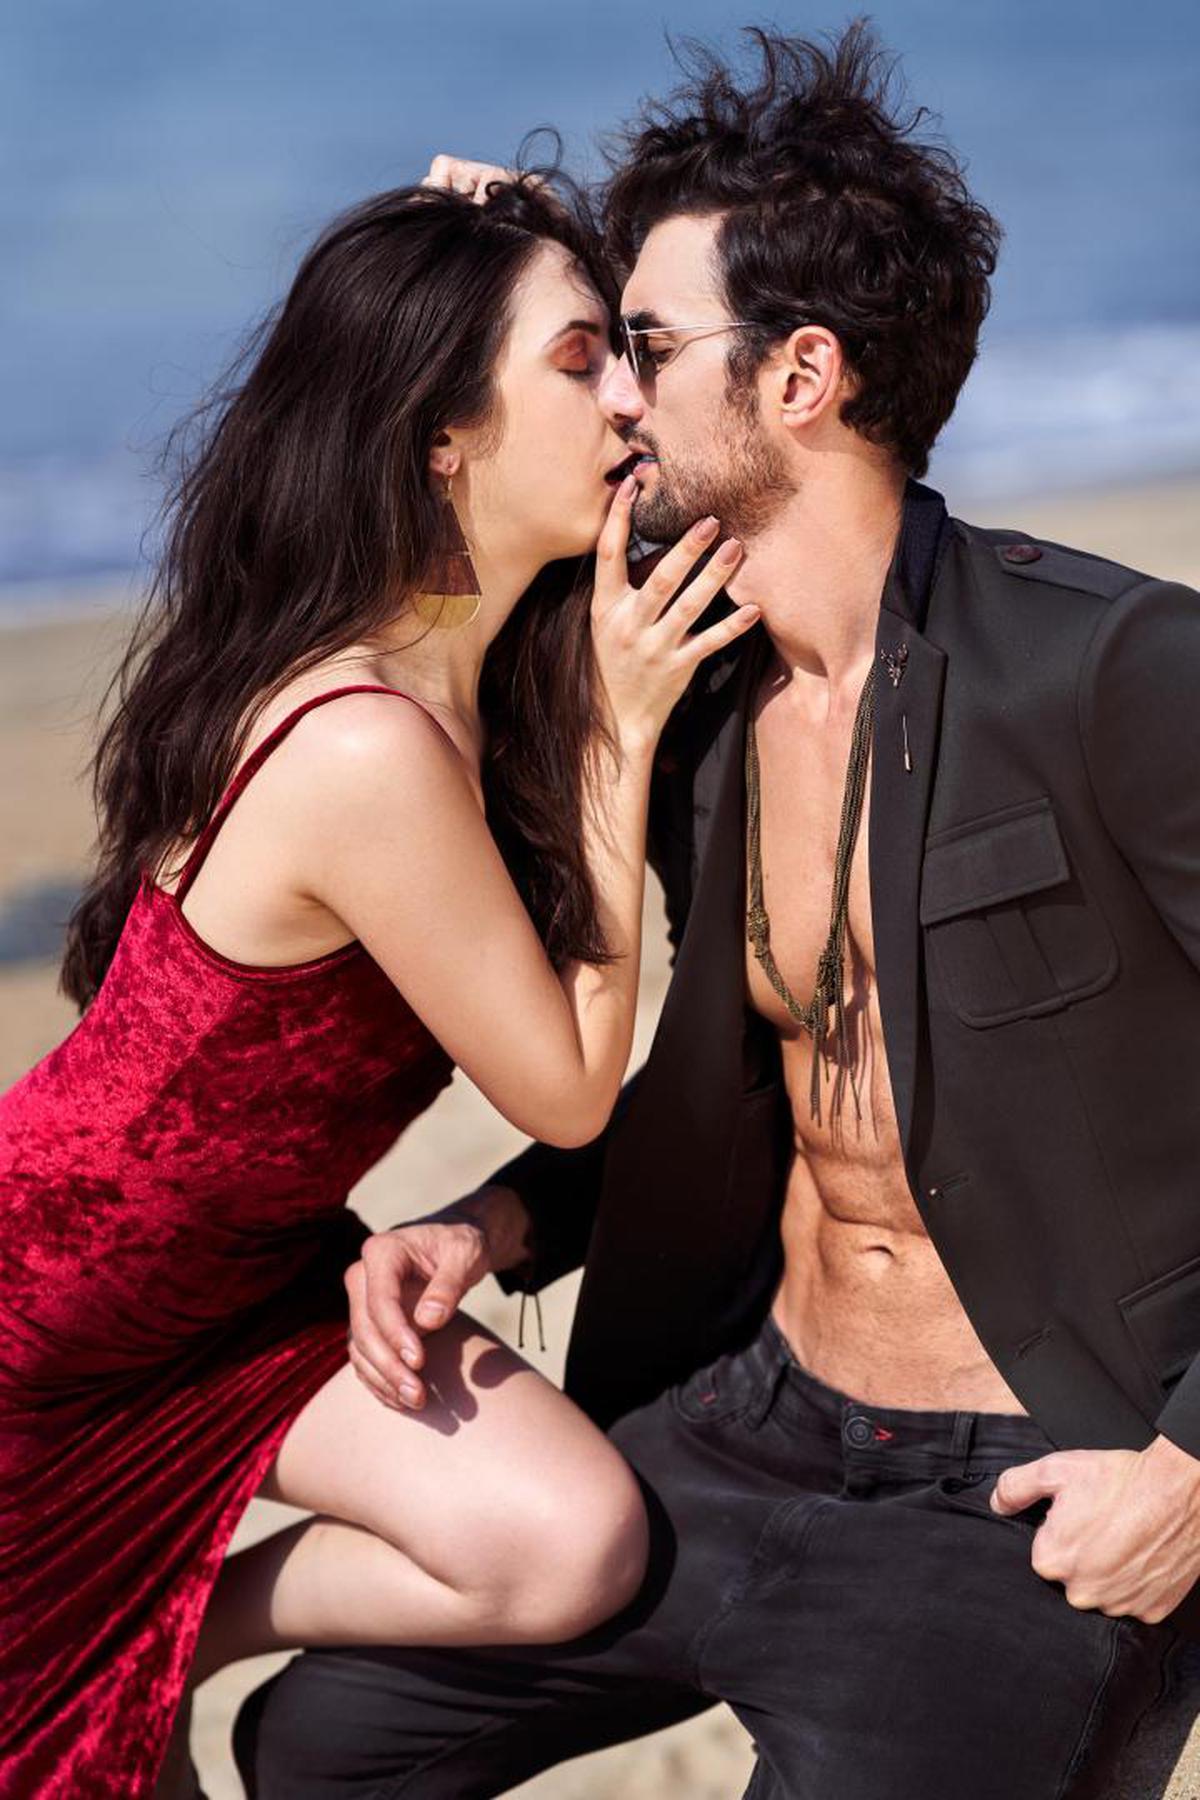 Image of Romance, Interaction etc.